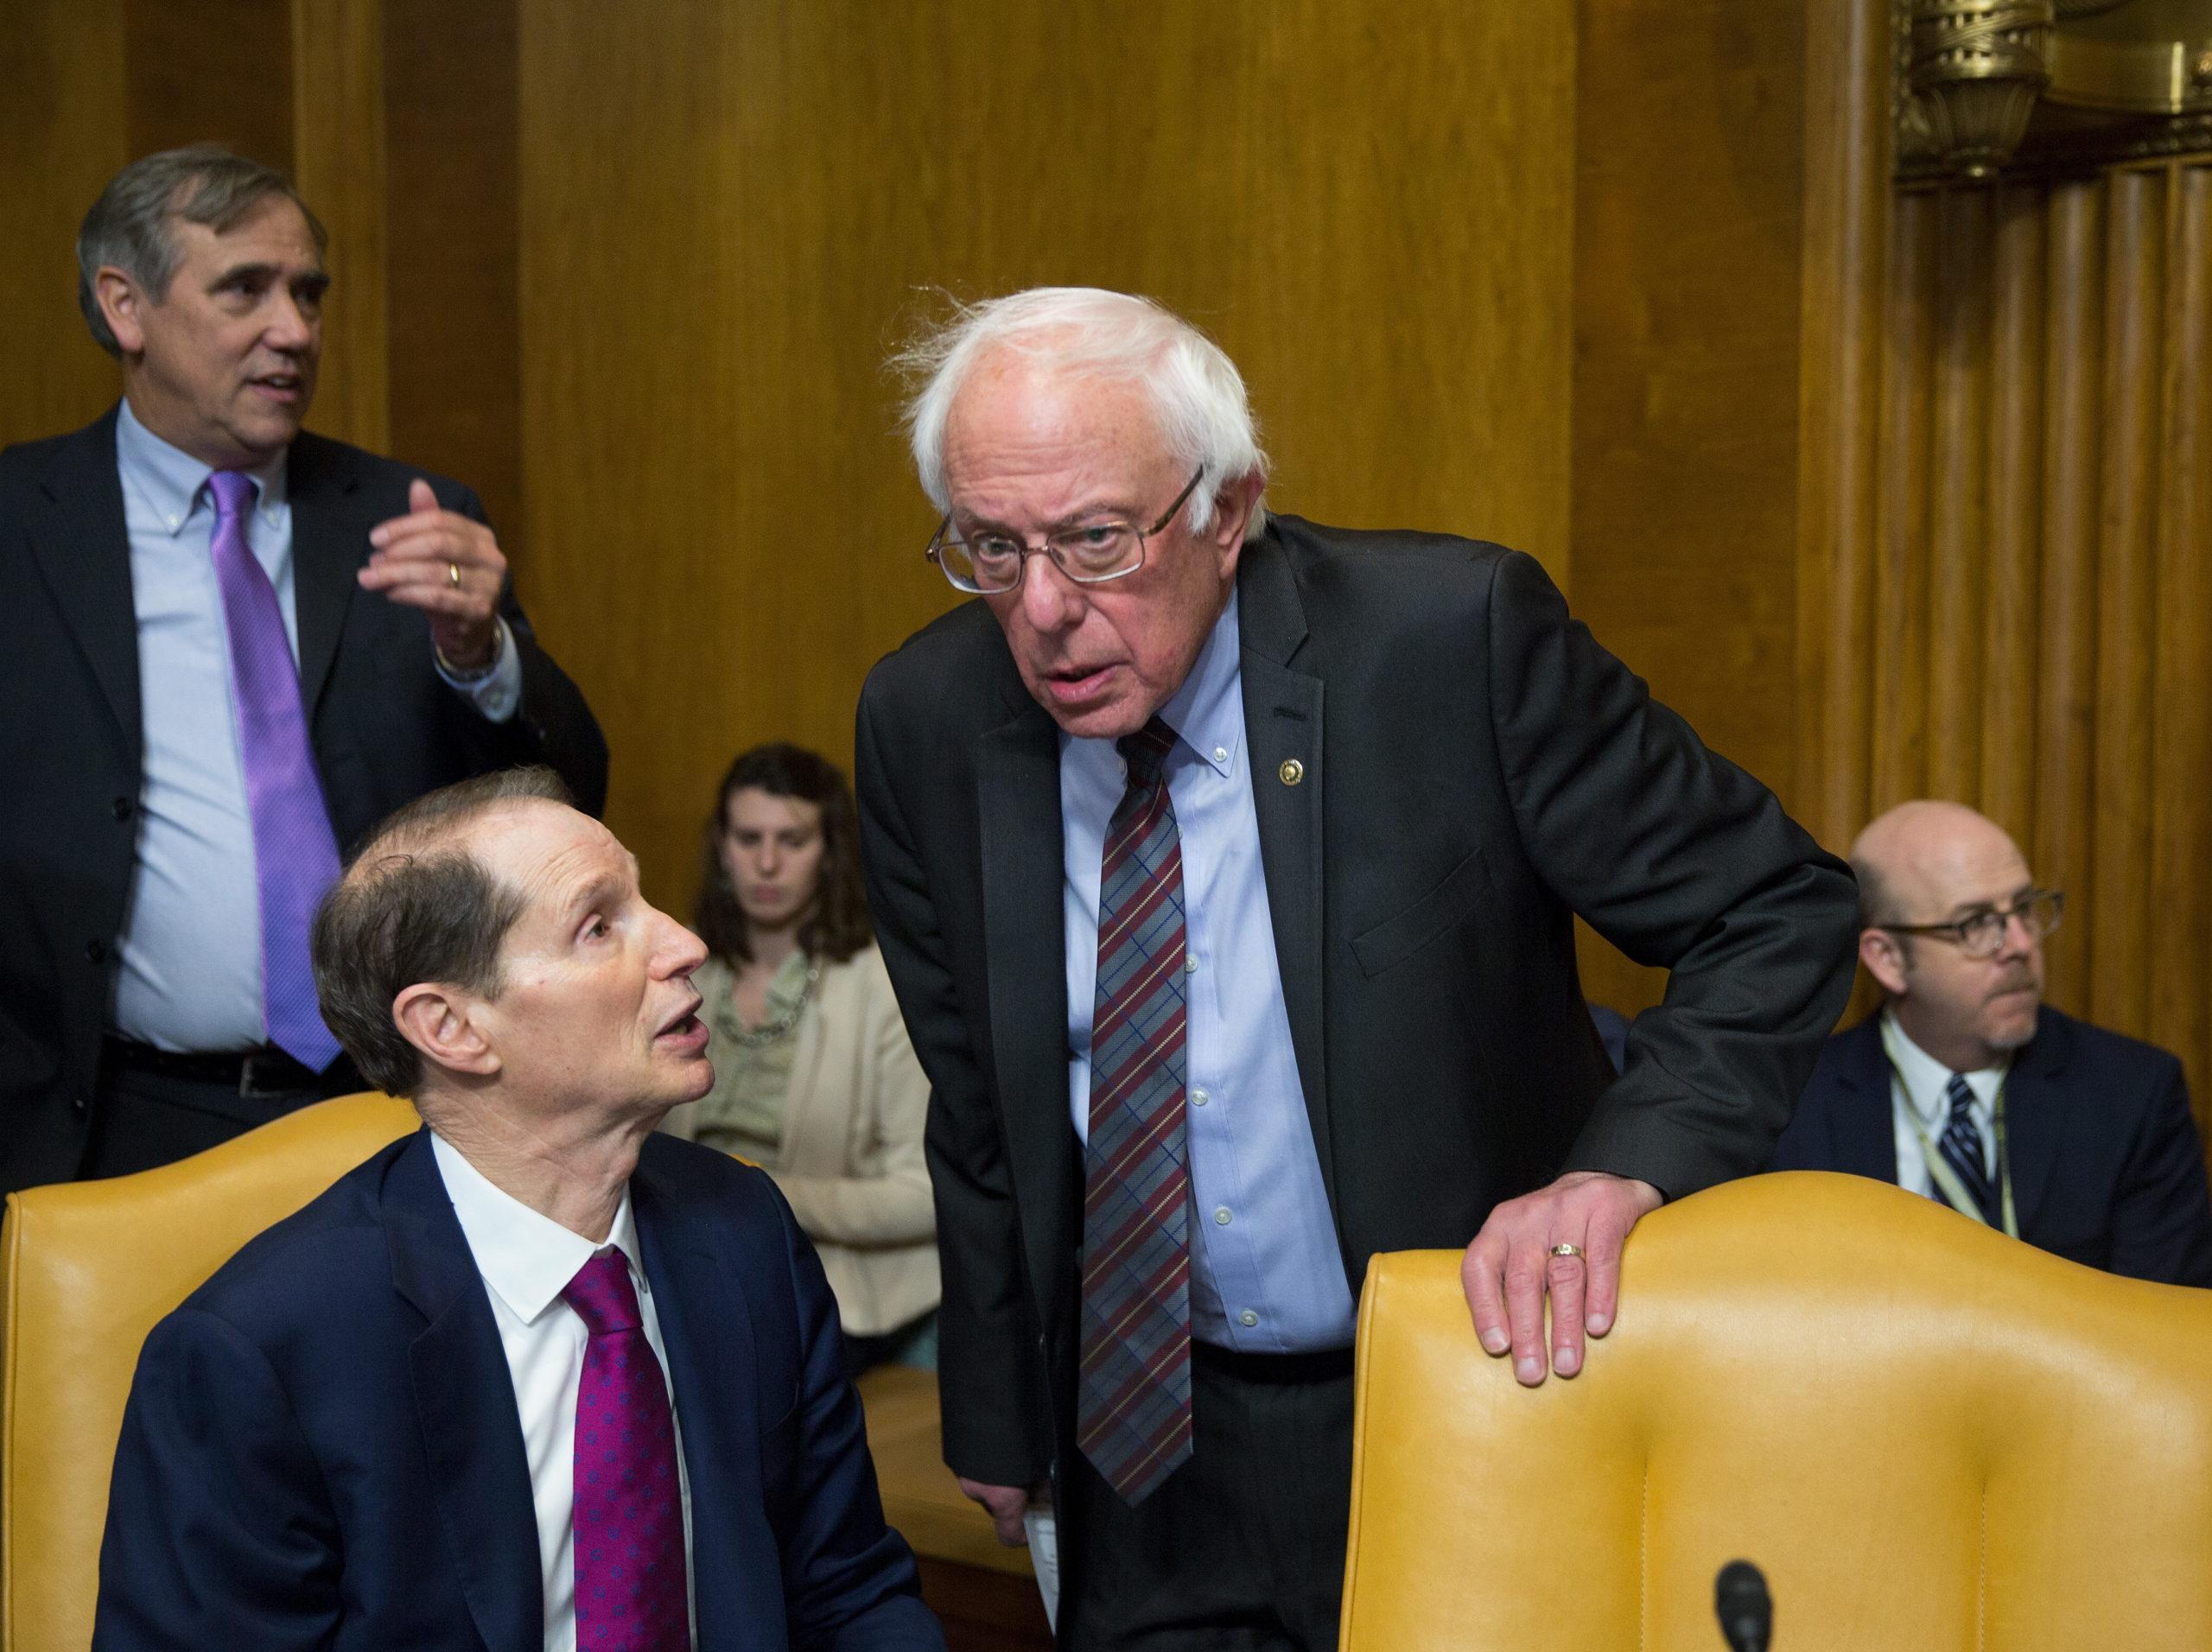 Sen. Ron Wyden and Sen. Bernie Sanders speak before a committee hearing in 2017. (Tasos Katopodis/Getty Images)